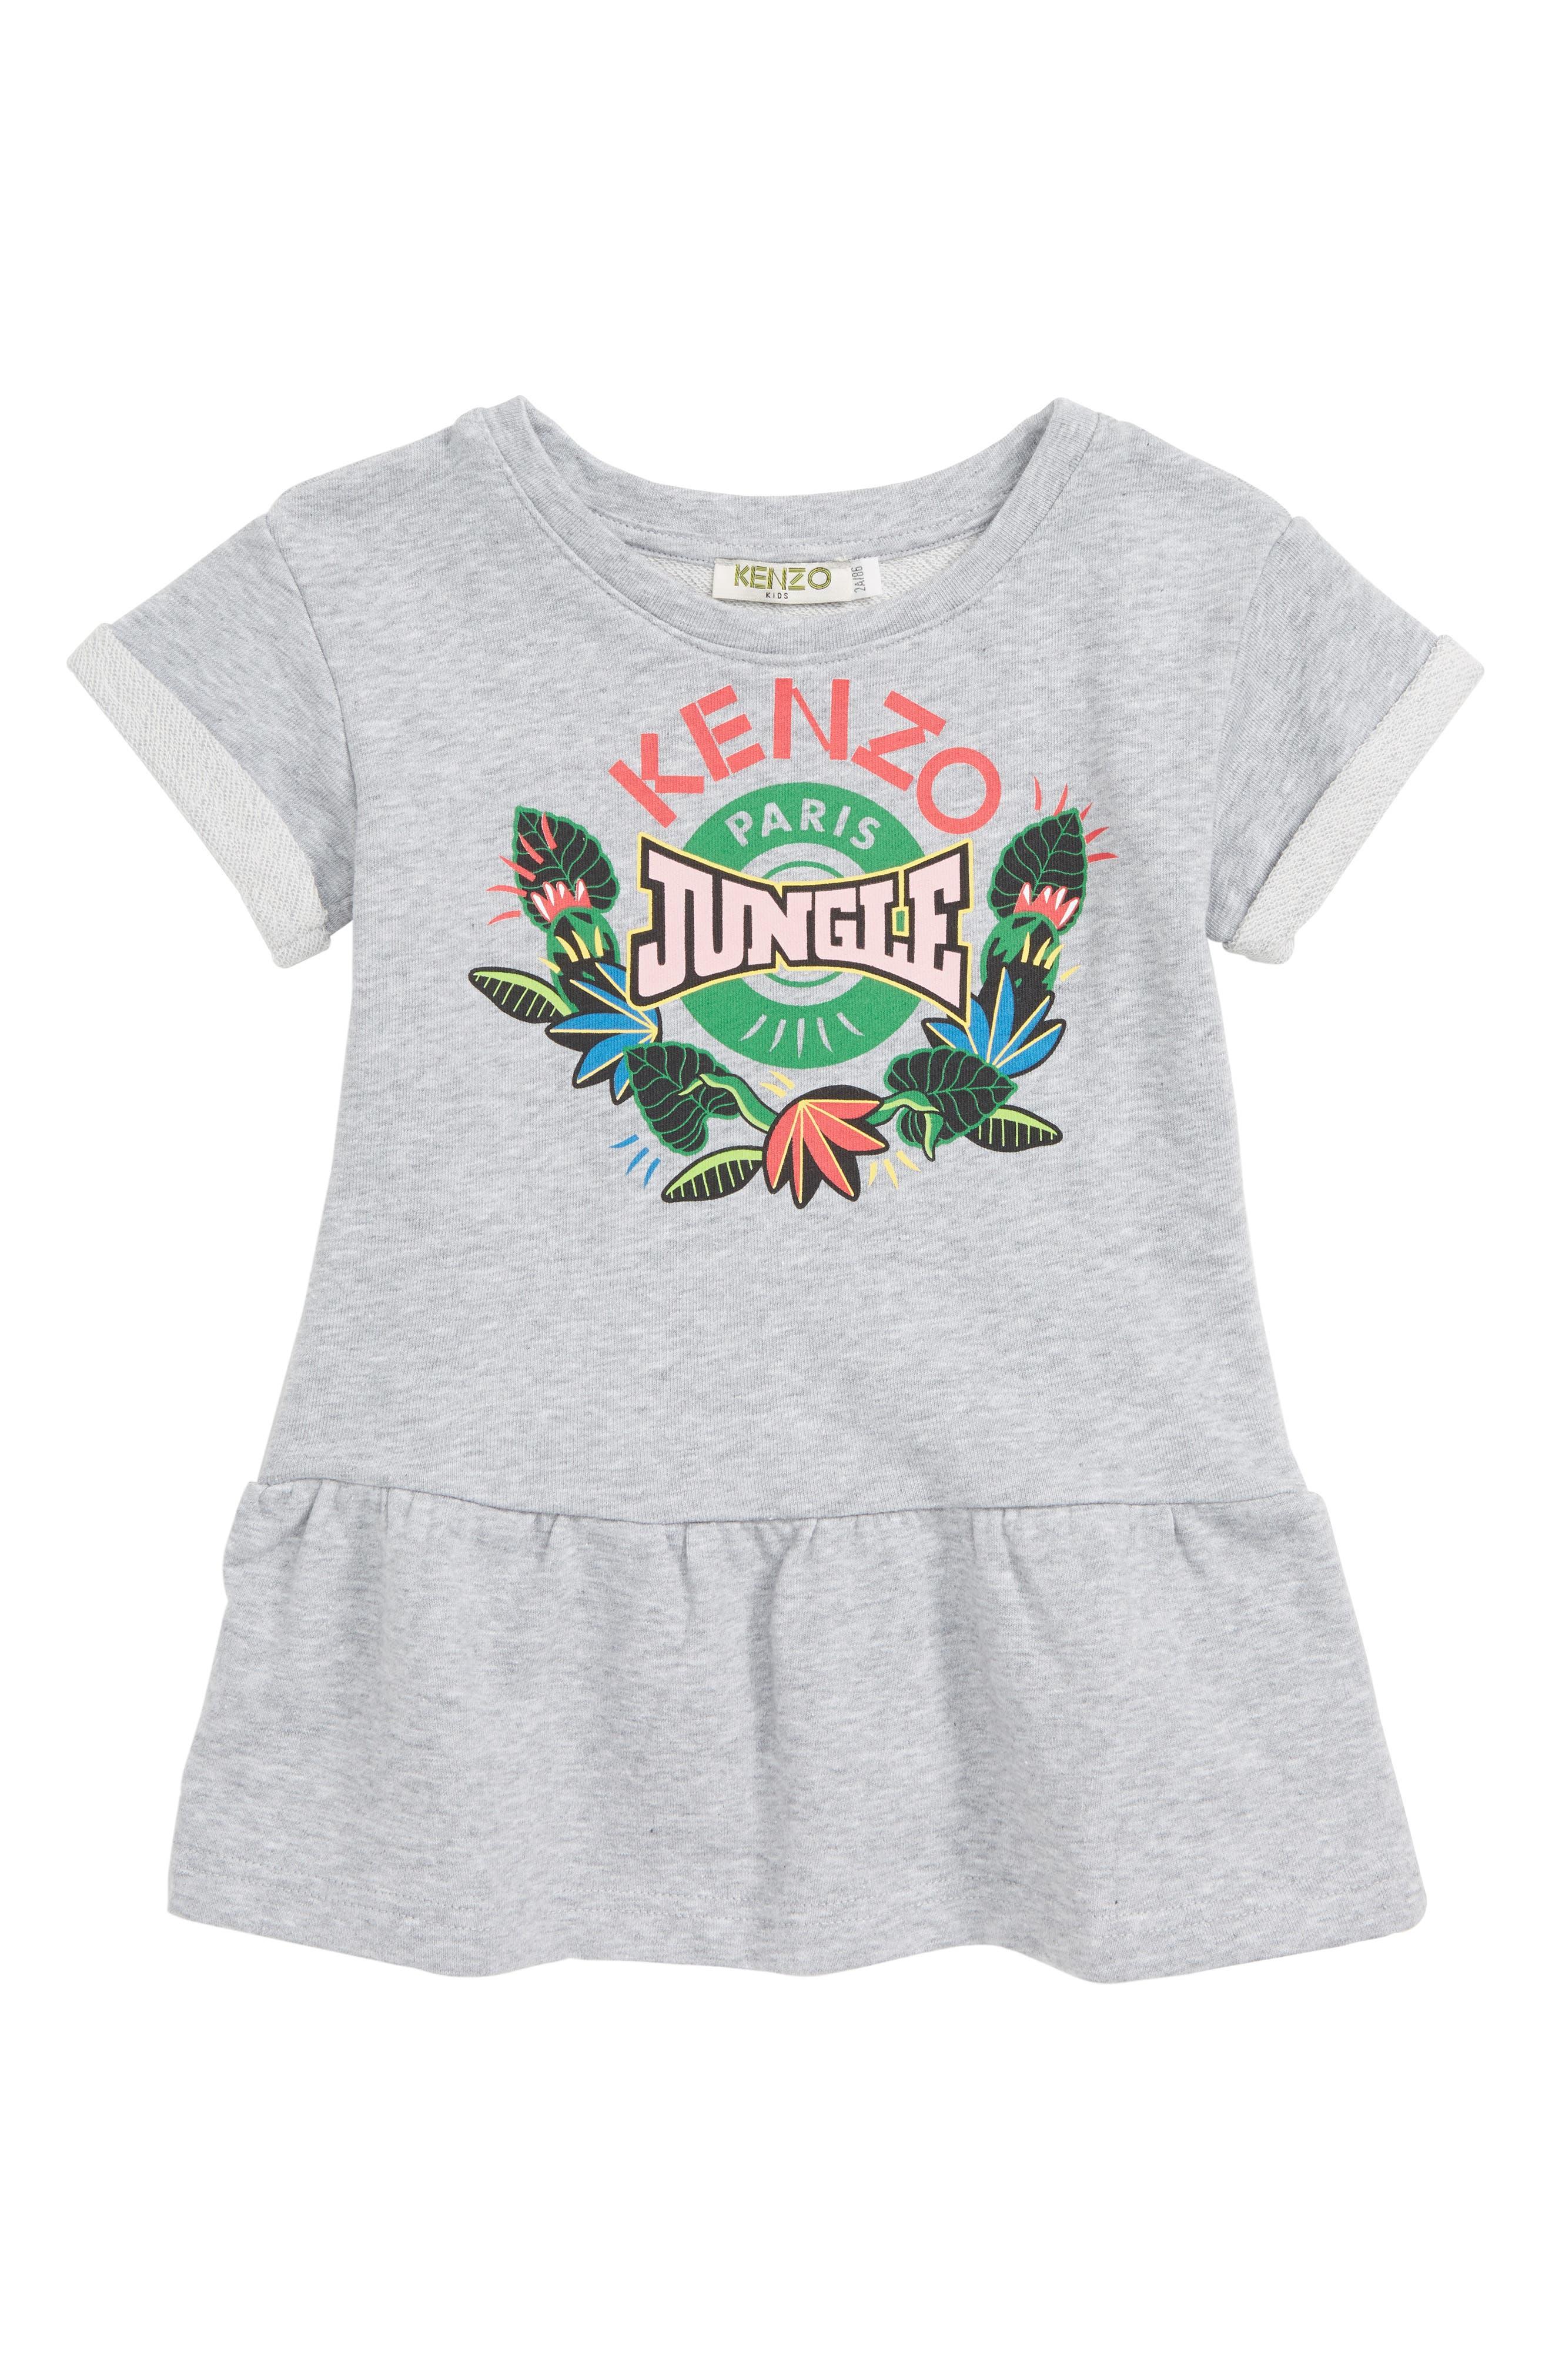 KENZO Jungle Fleece Dress, Main, color, MARLE GREY